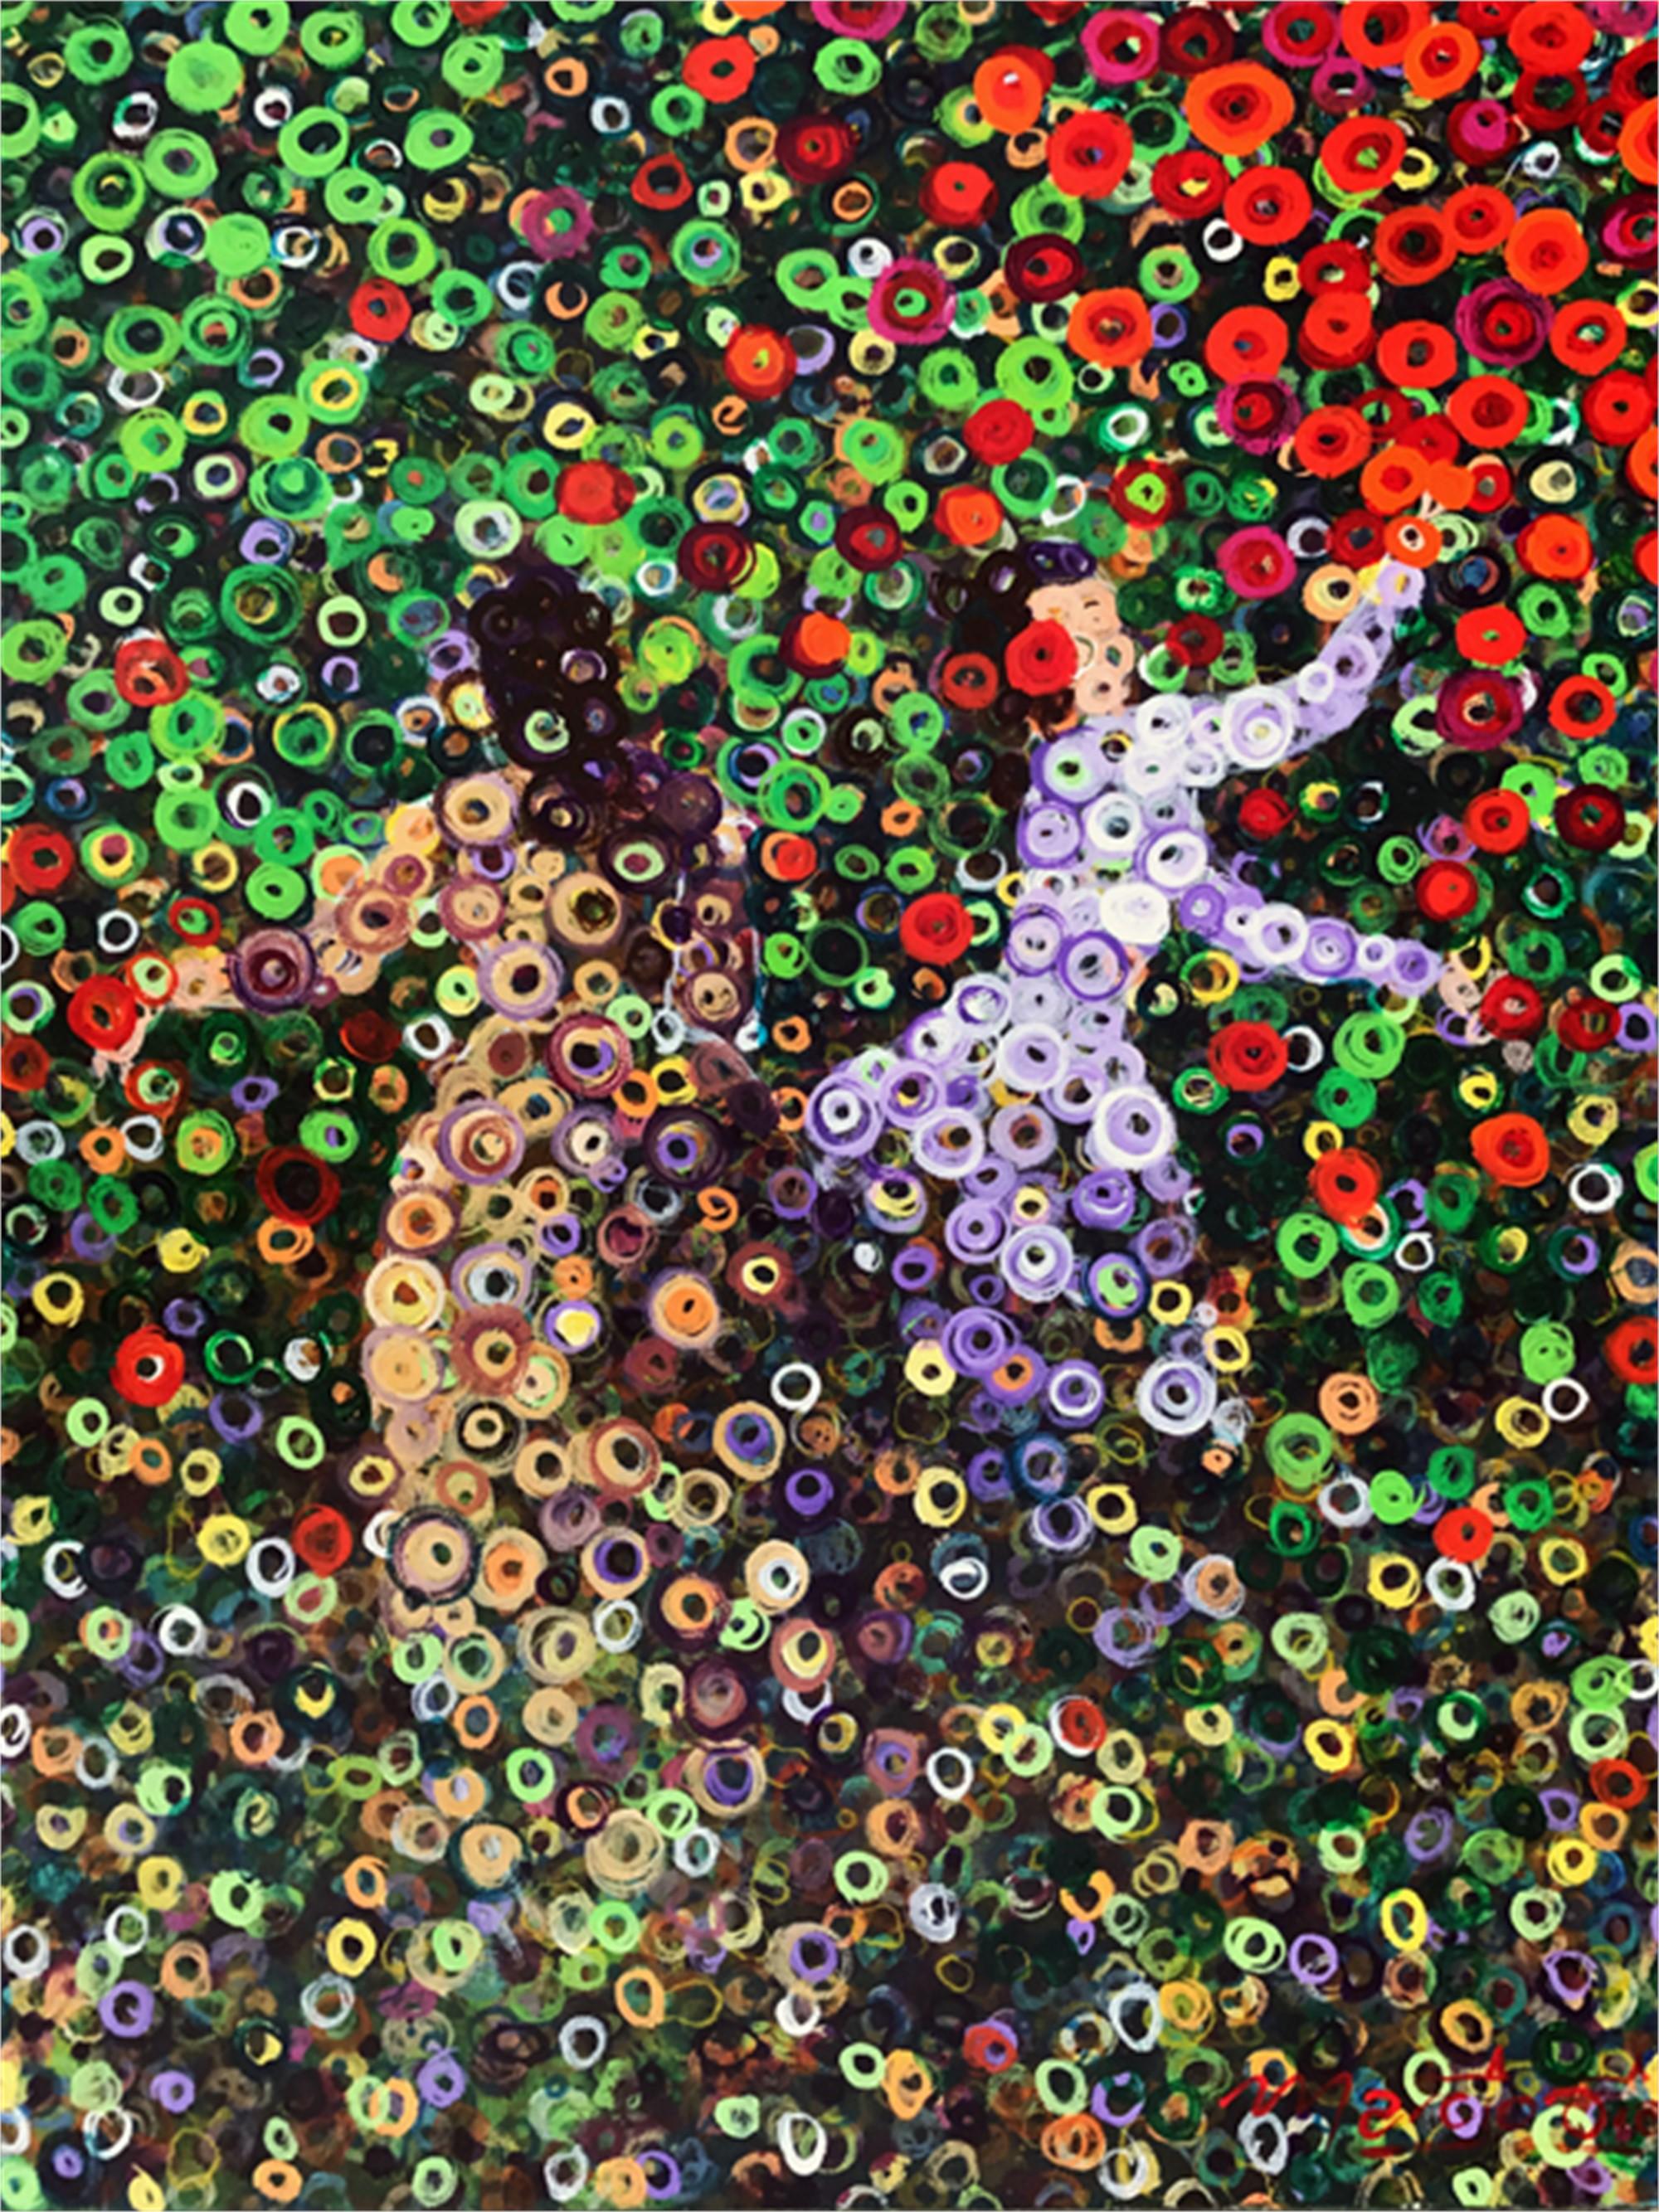 Harvesting by Marcio Diaz